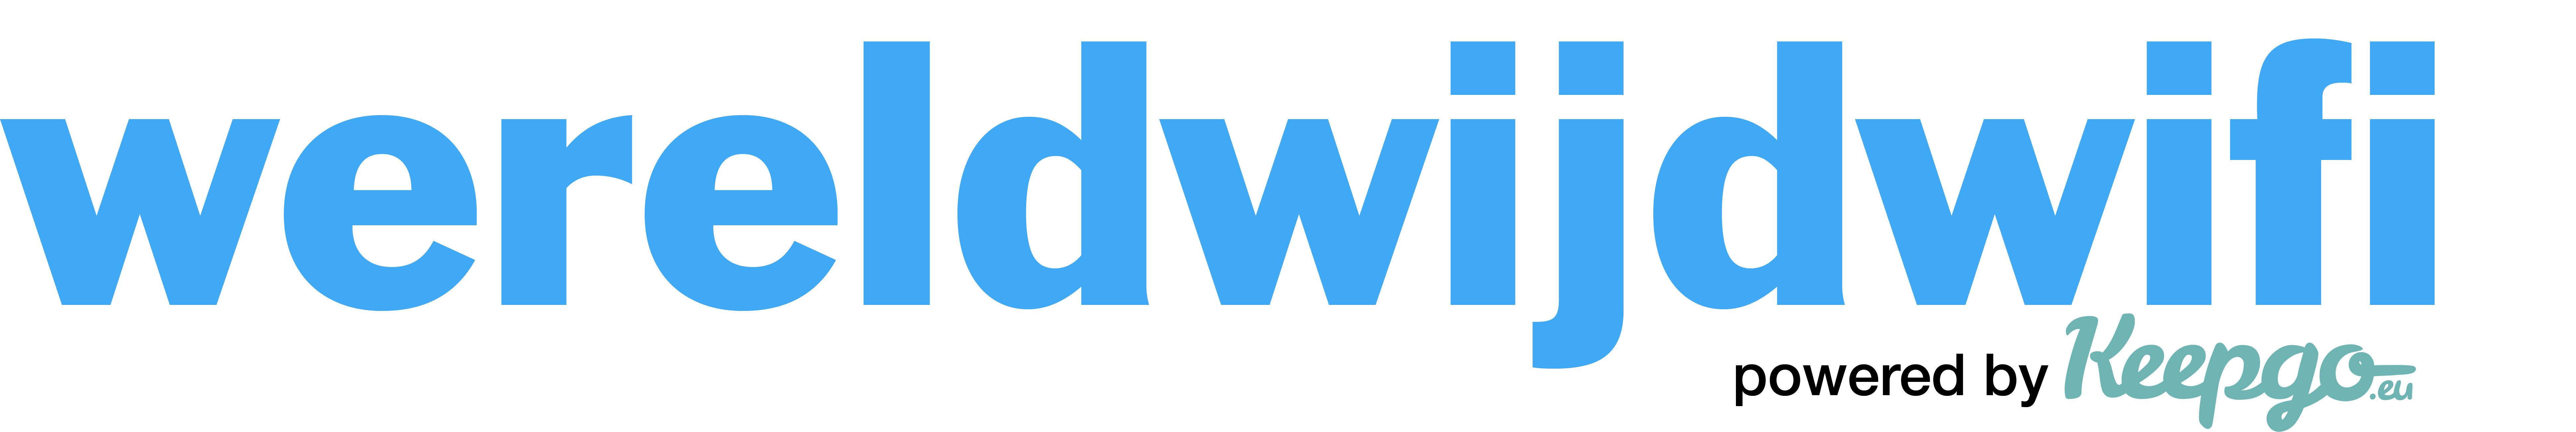 Wereldwijdwifi